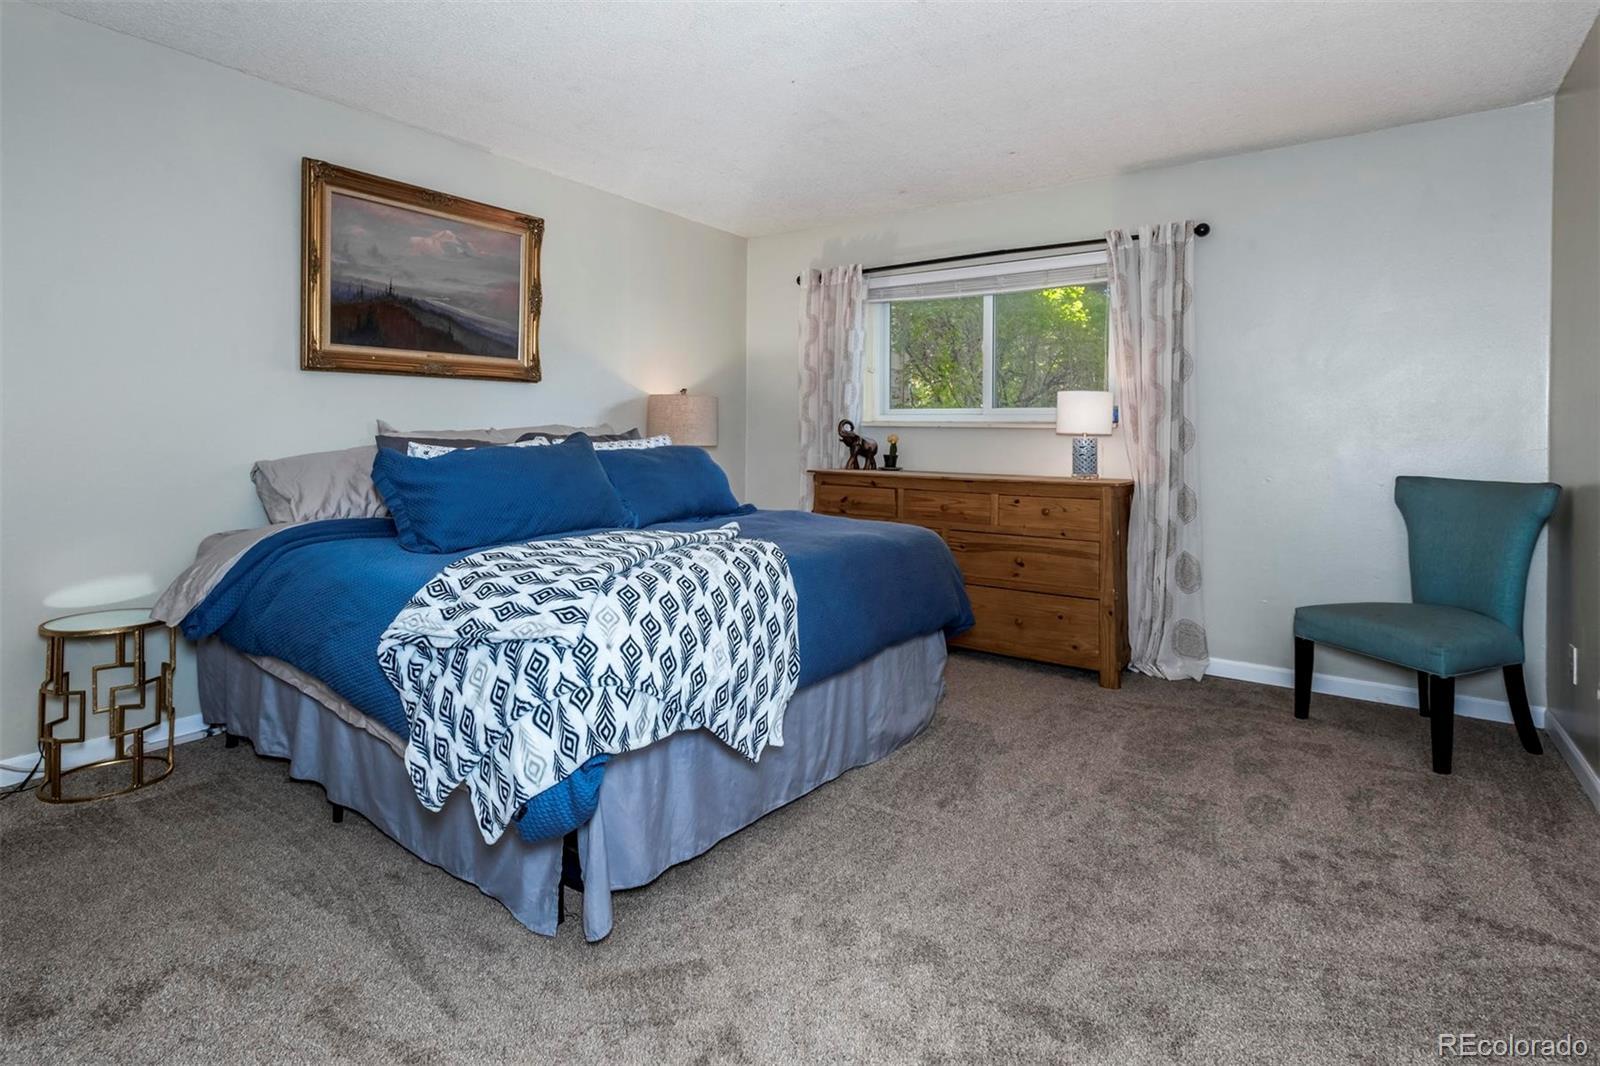 MLS# 6340316 - 11 - 420 Zang Street #3-102, Lakewood, CO 80228